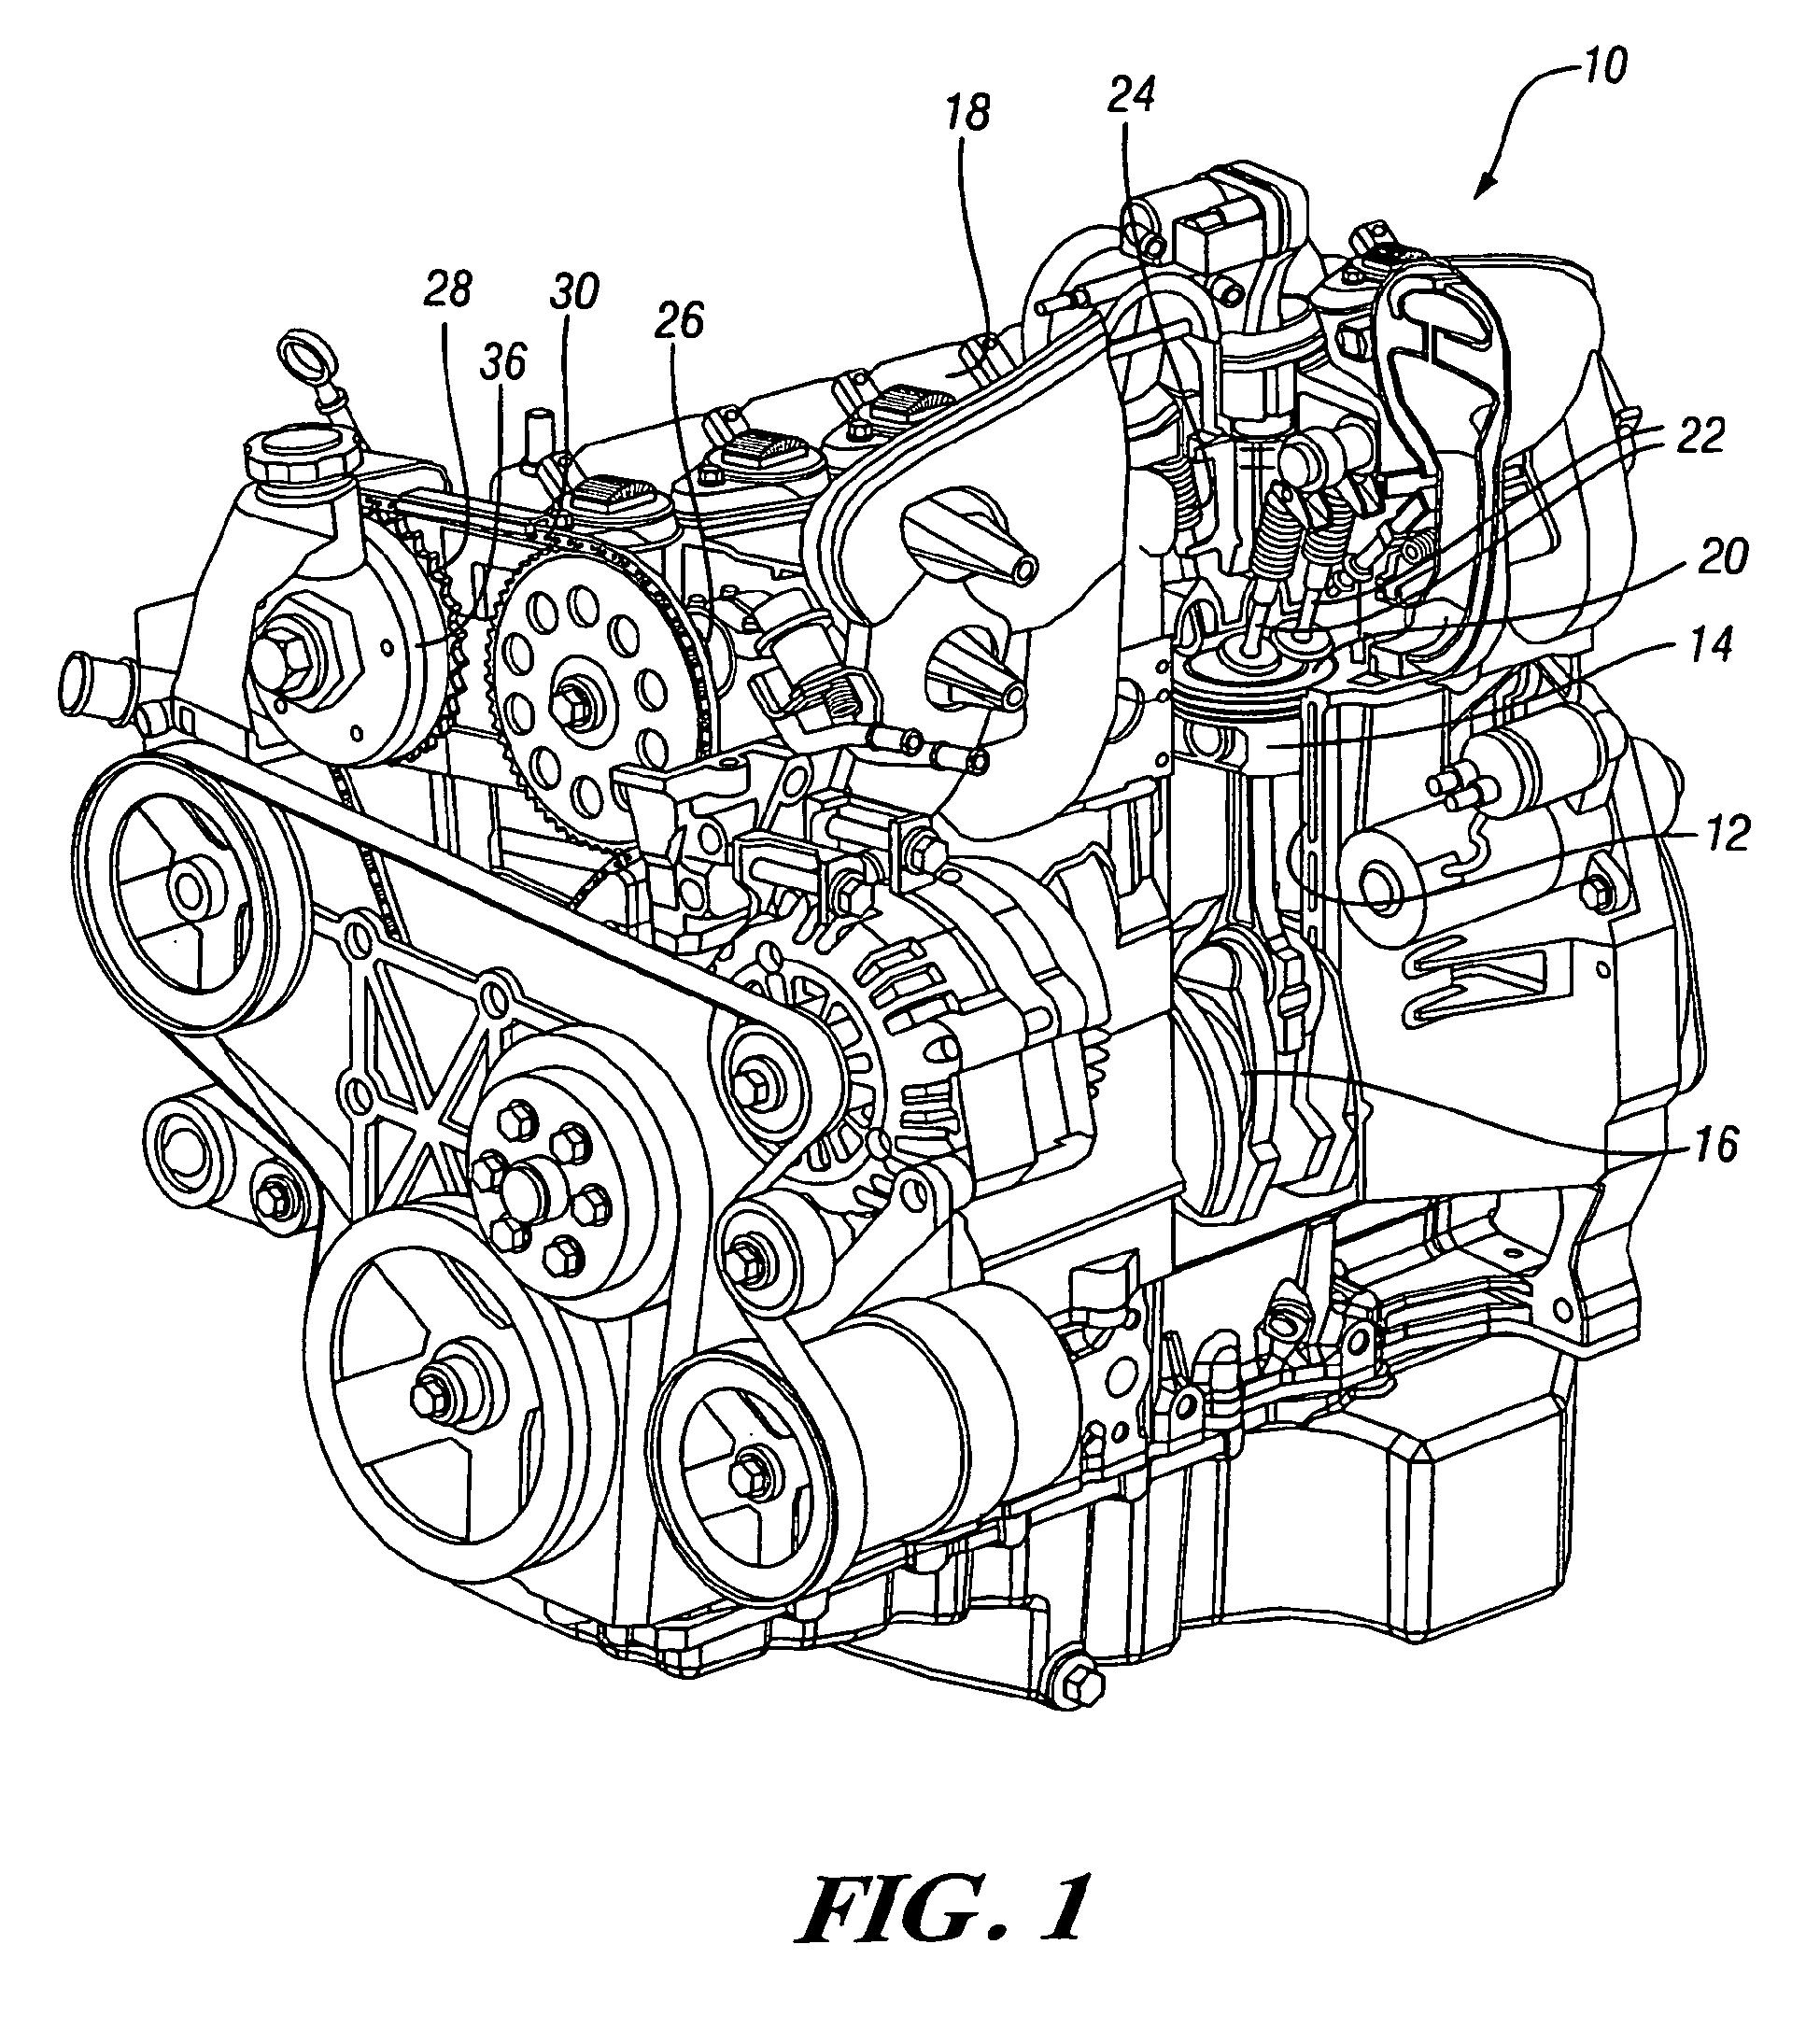 patent ep1541814b1